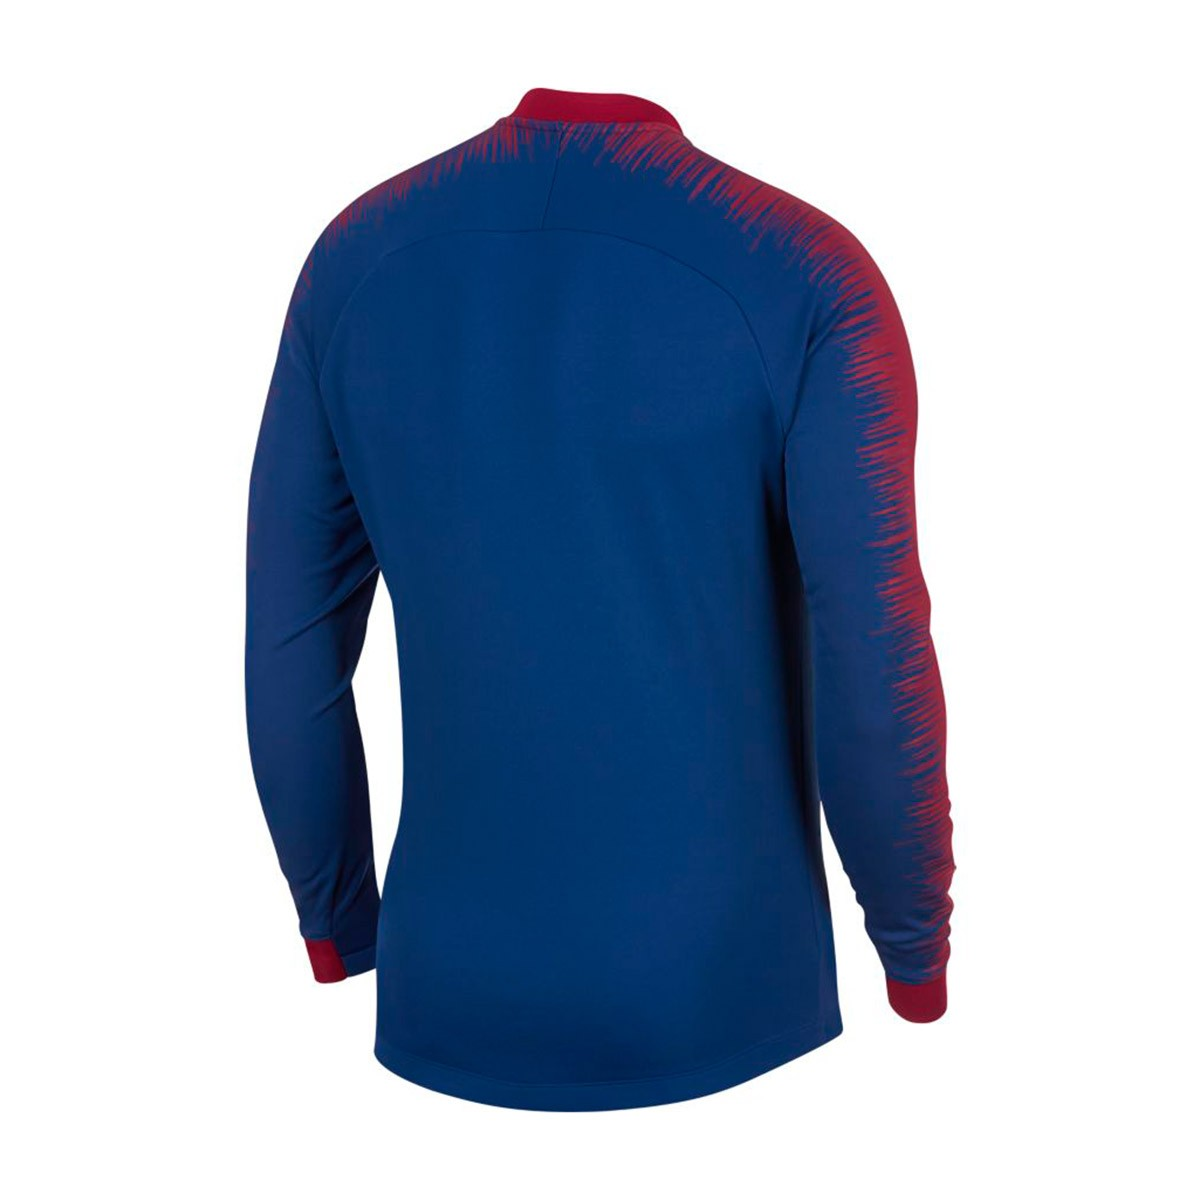 452f6bb80b8 Jacket Nike FC Barcelona Pre-Match 2018-2019 Deep royal blue-University gold  - Football store Fútbol Emotion